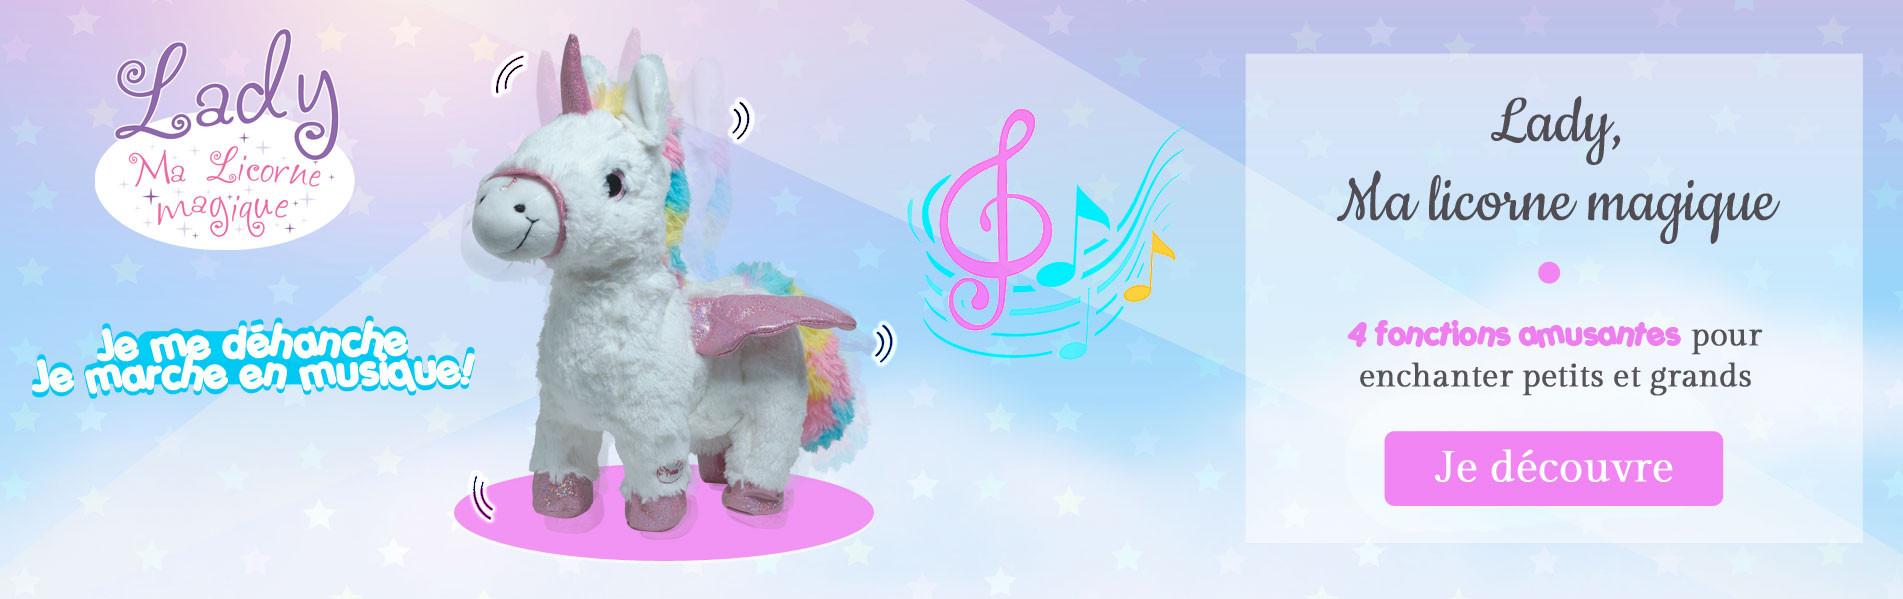 Lady unicorn magic